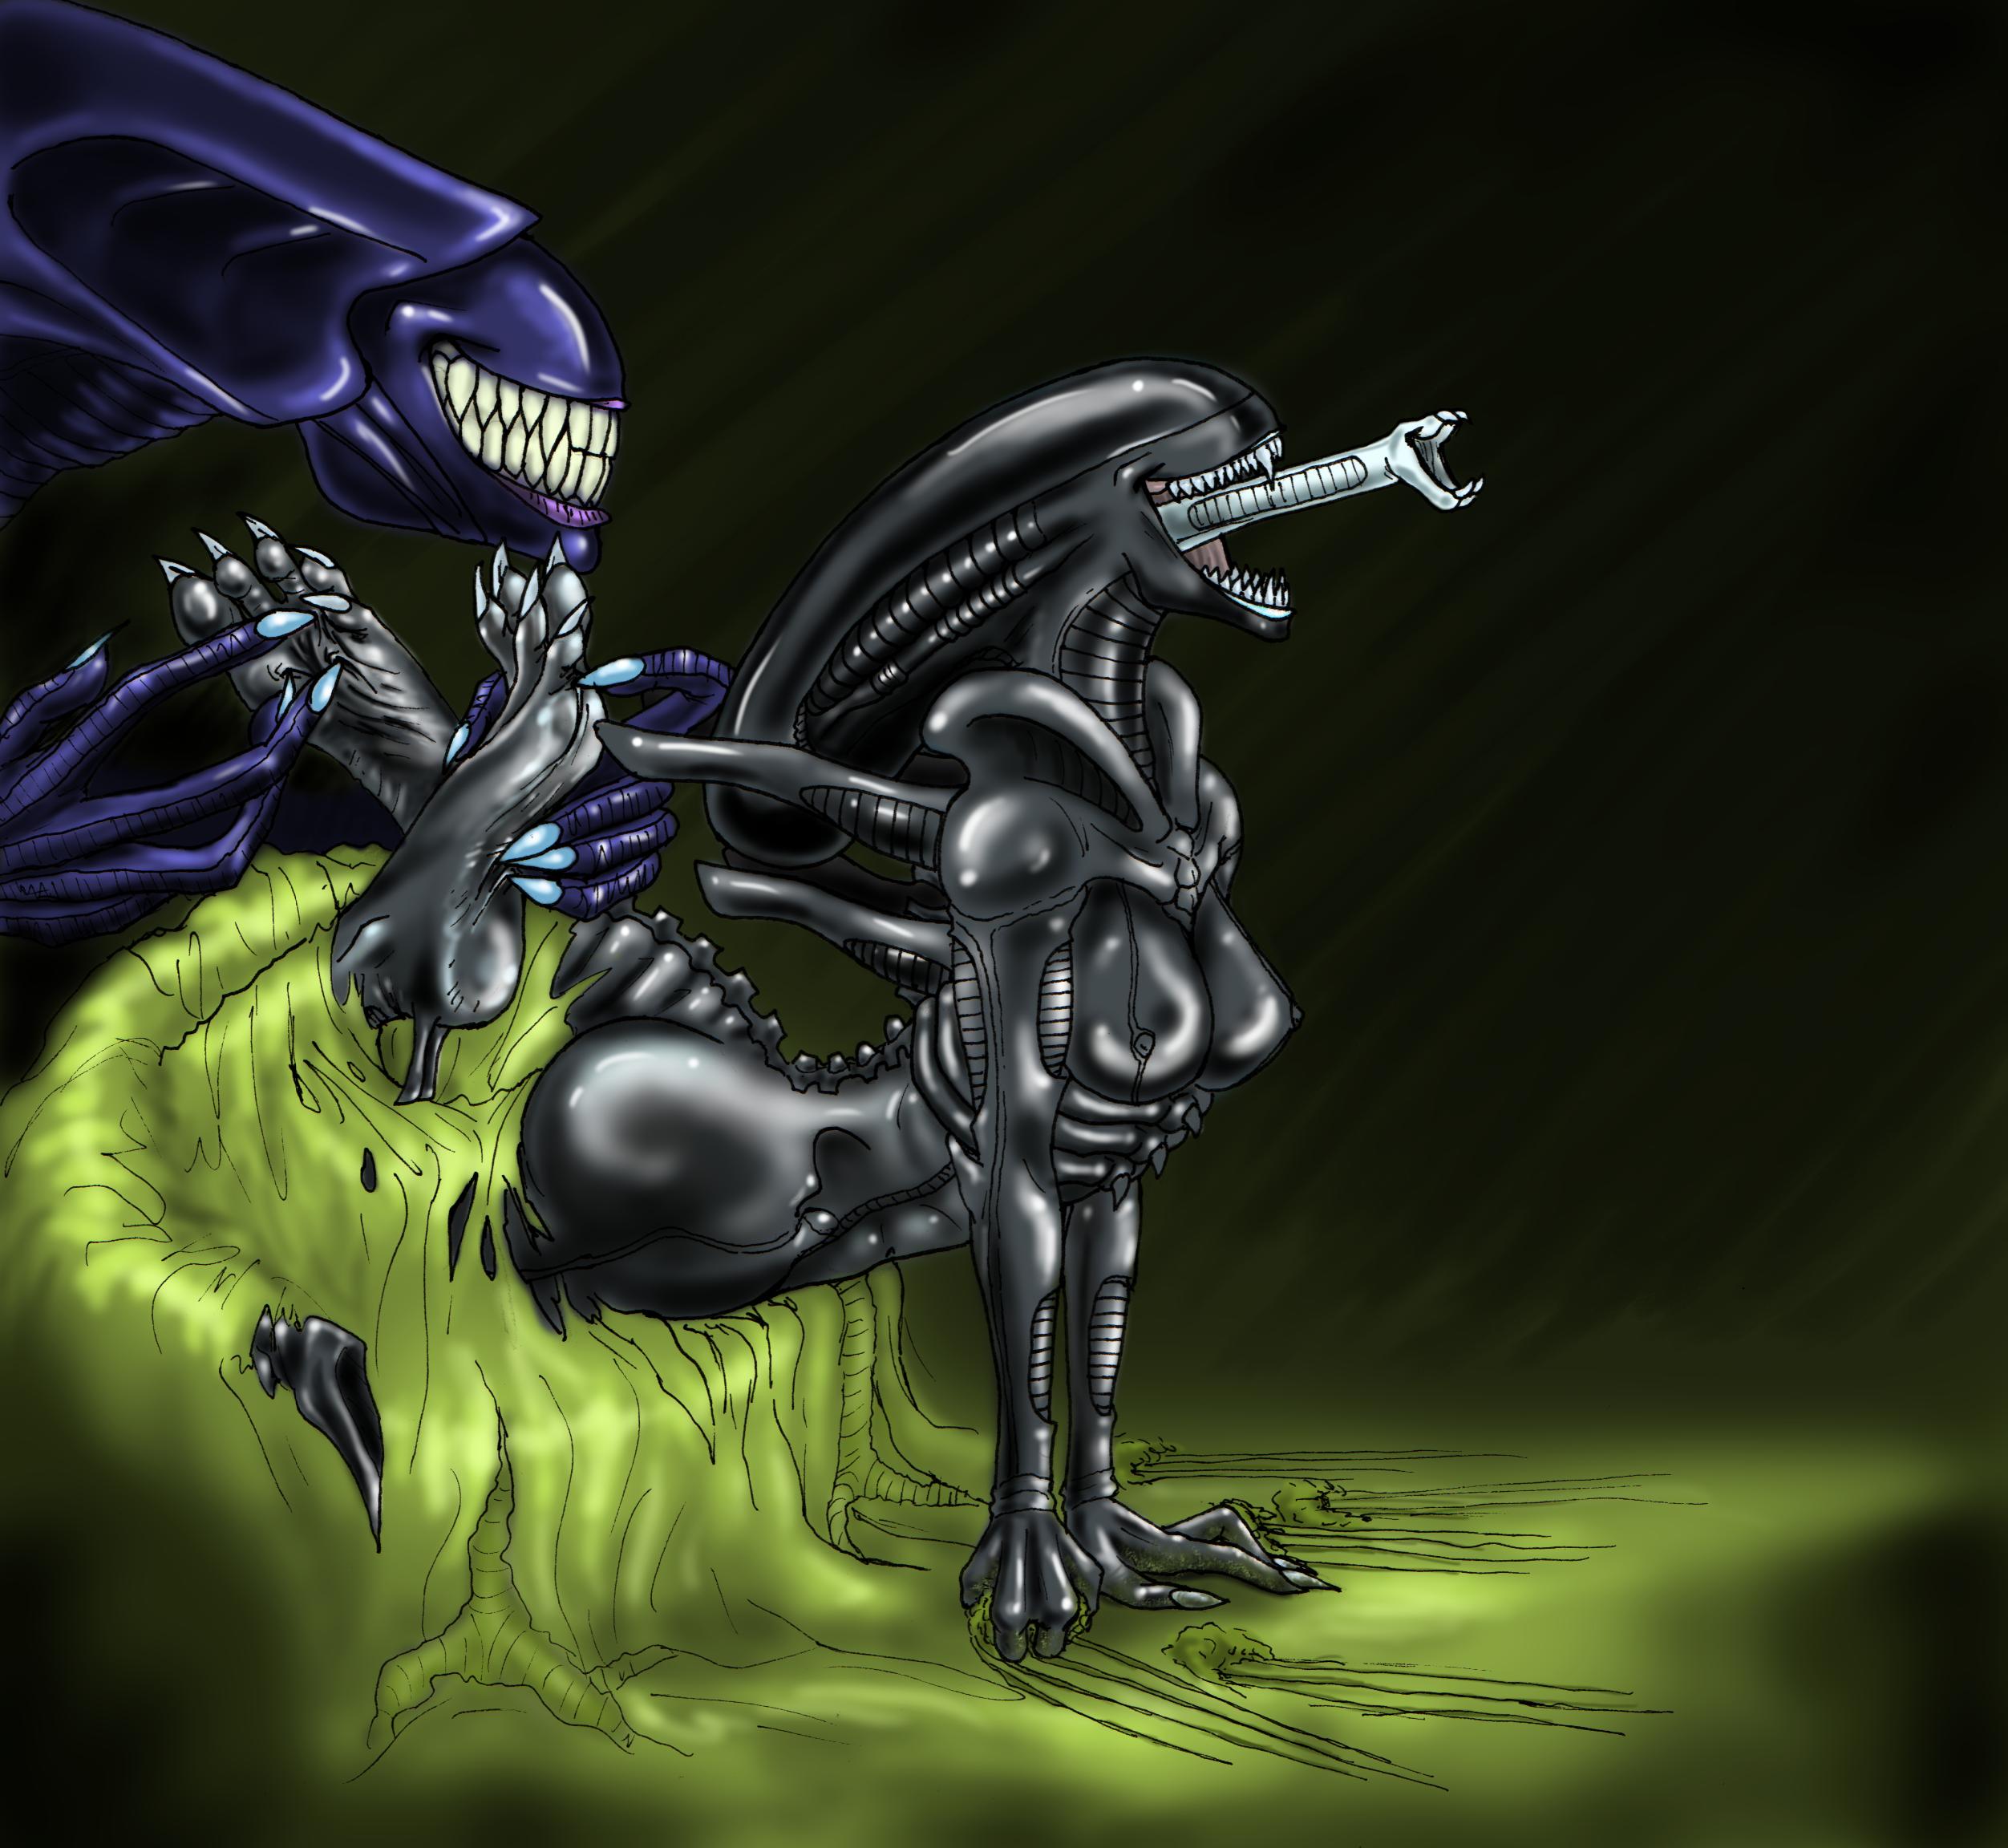 Deviantart alien porn - Queen pet sans drool blush and laughter  quintonquill hynf png 2504x2304